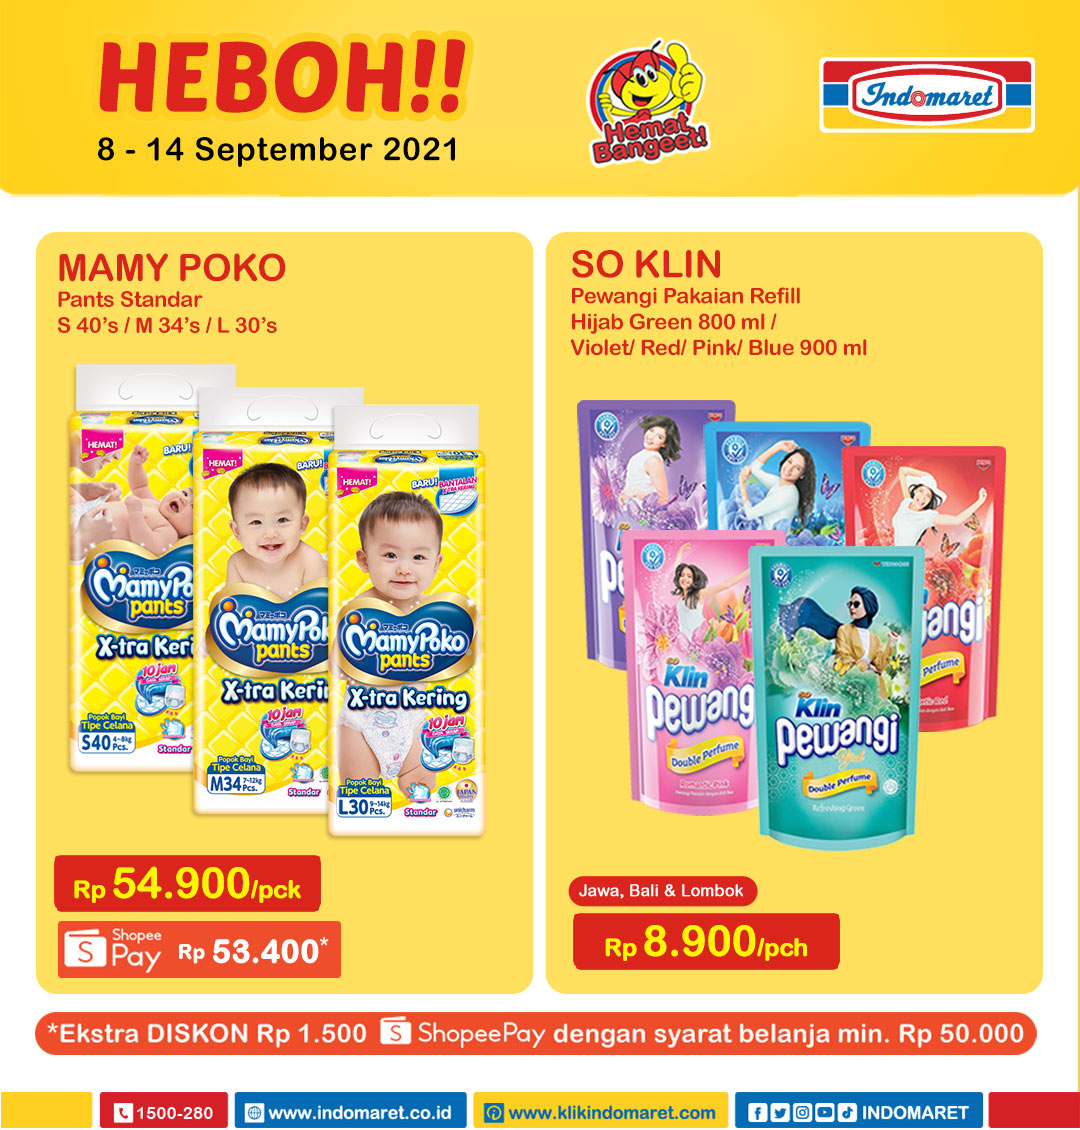 Promo INDOMARET Heboh, Product of The Week 8 - 14 September 2021